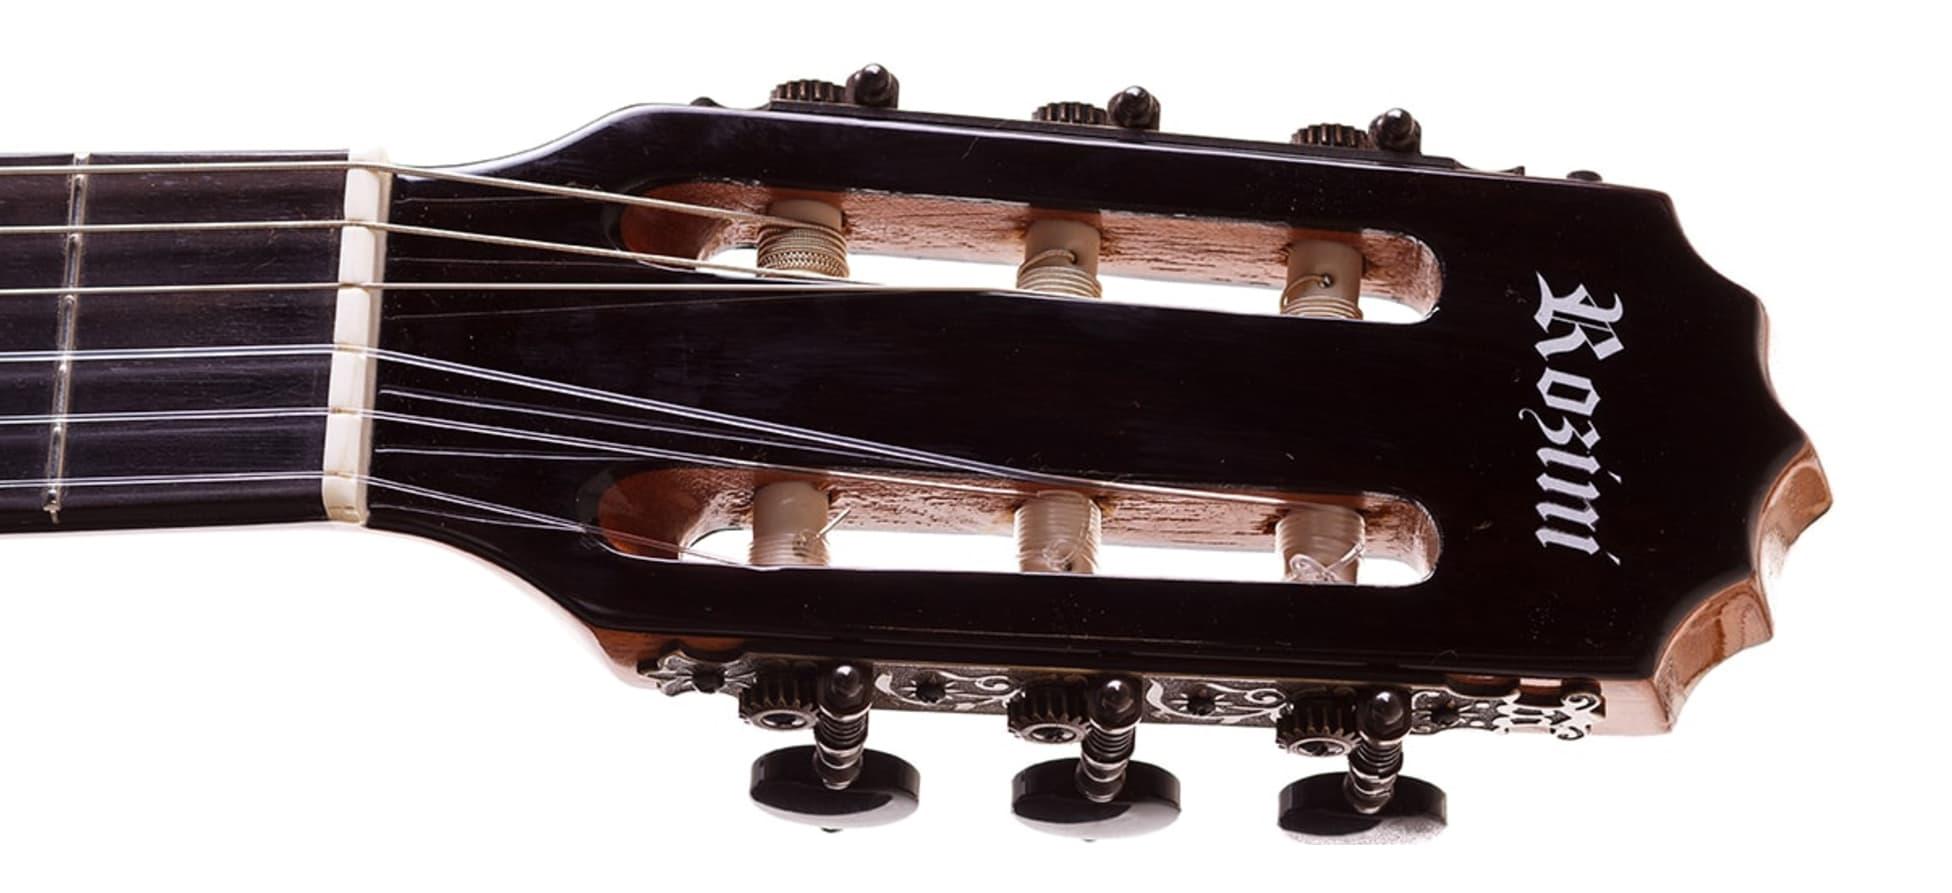 Violão Rozini Concertista Clássico RX216.AC.N.J